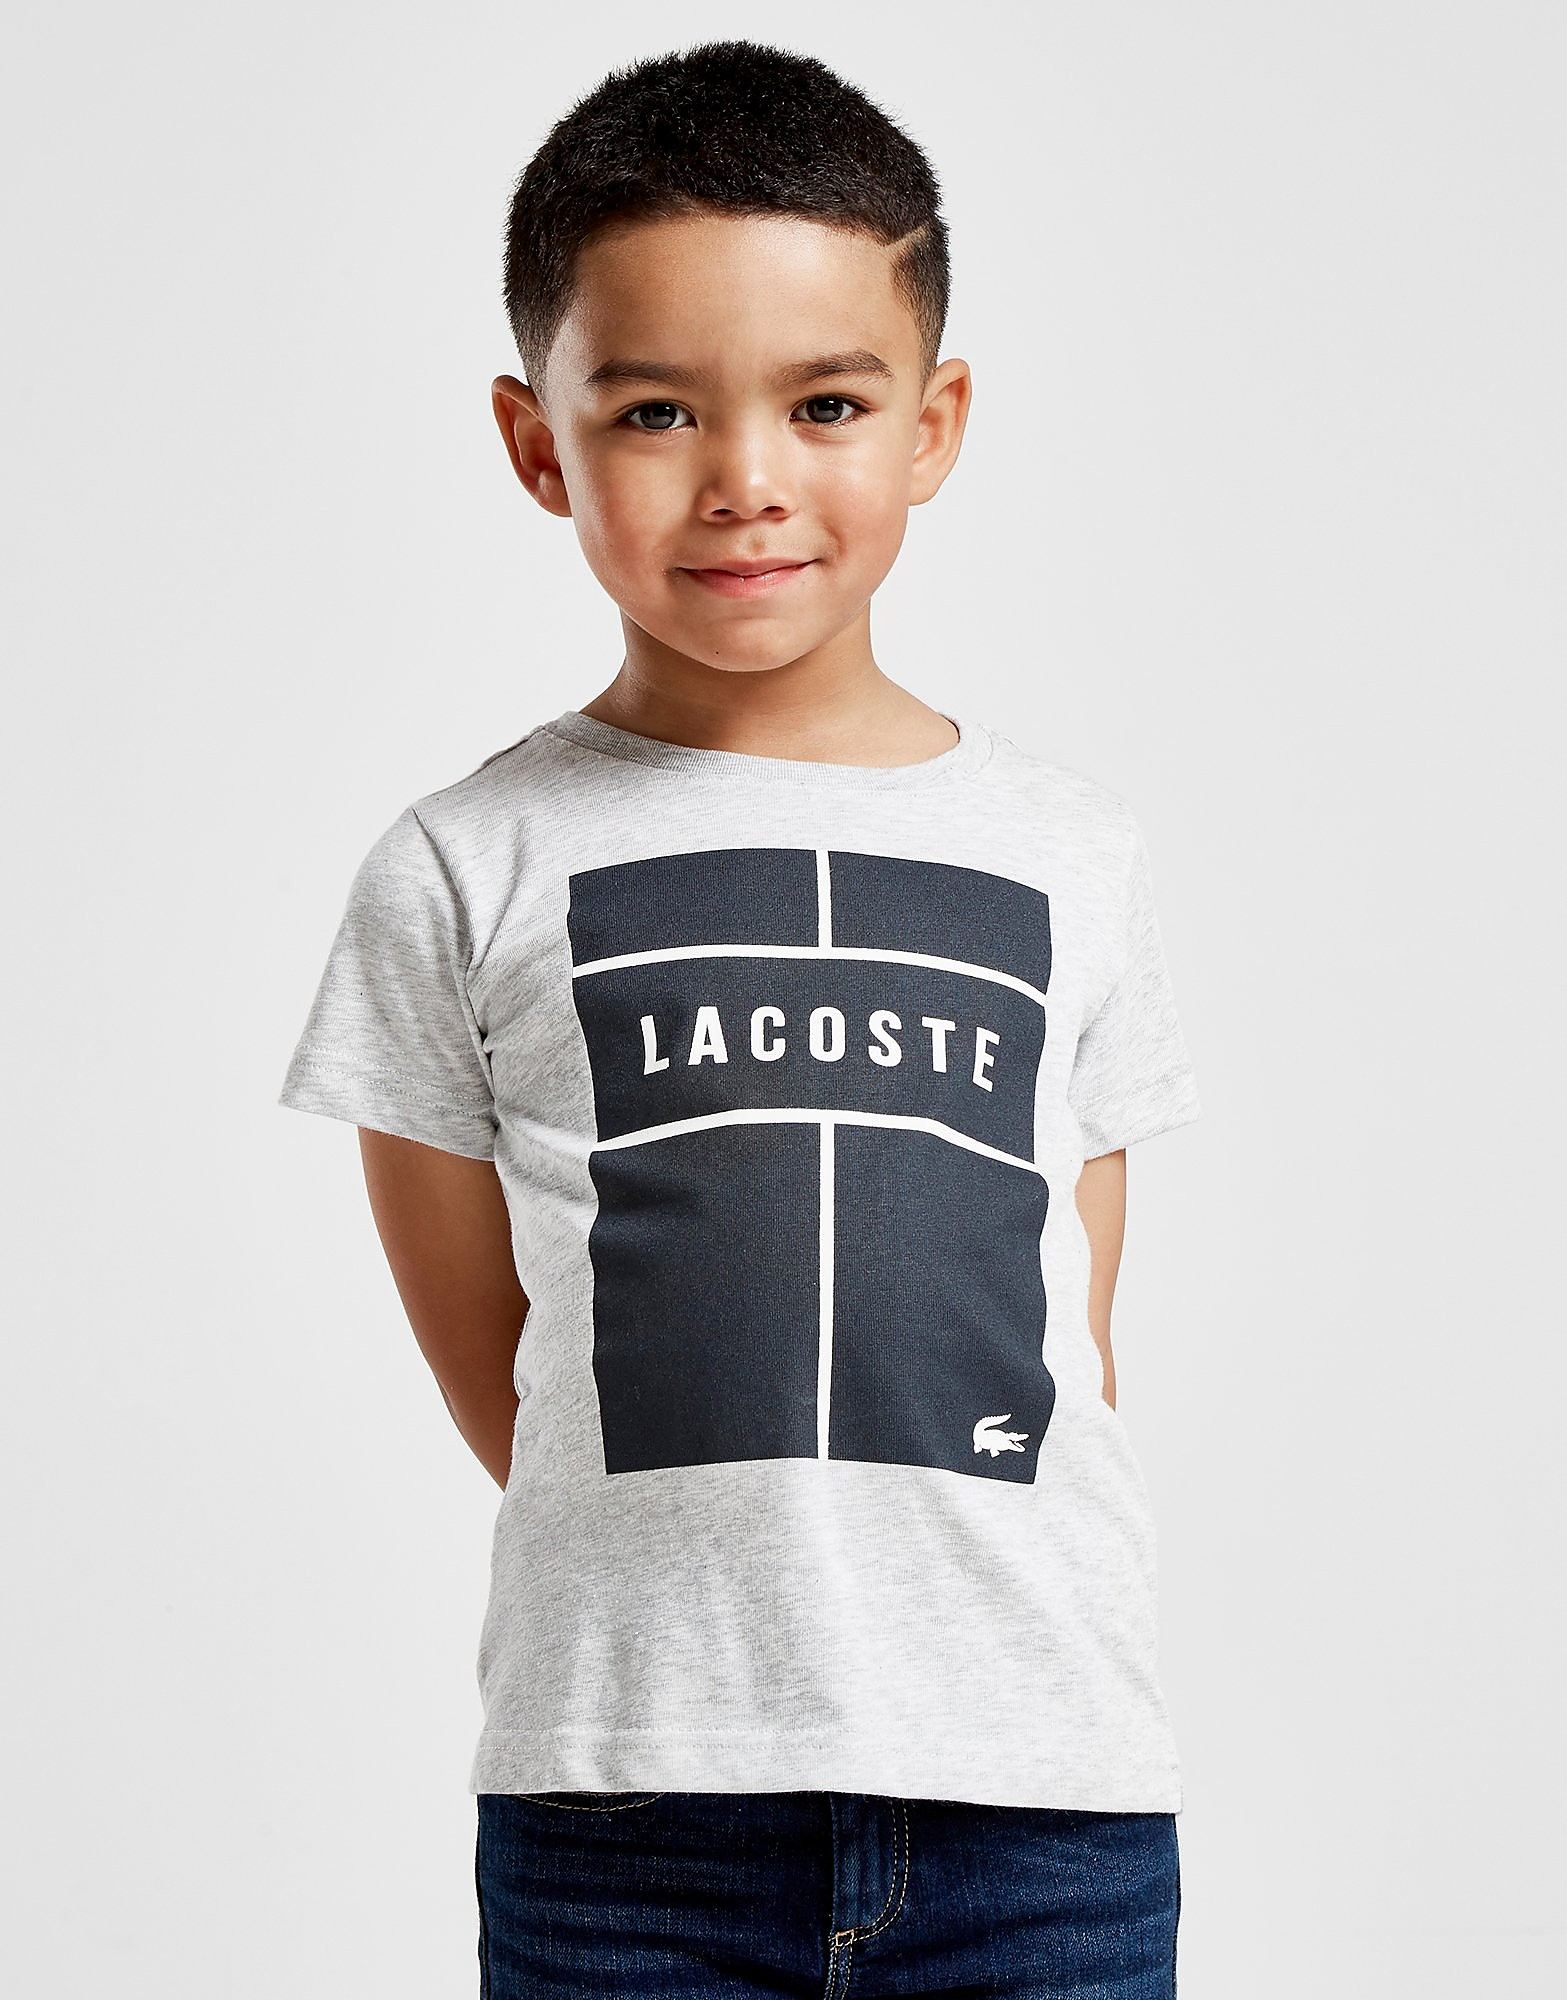 Lacoste Box Logo T-Shirt Kinderen - Grijs - Kind